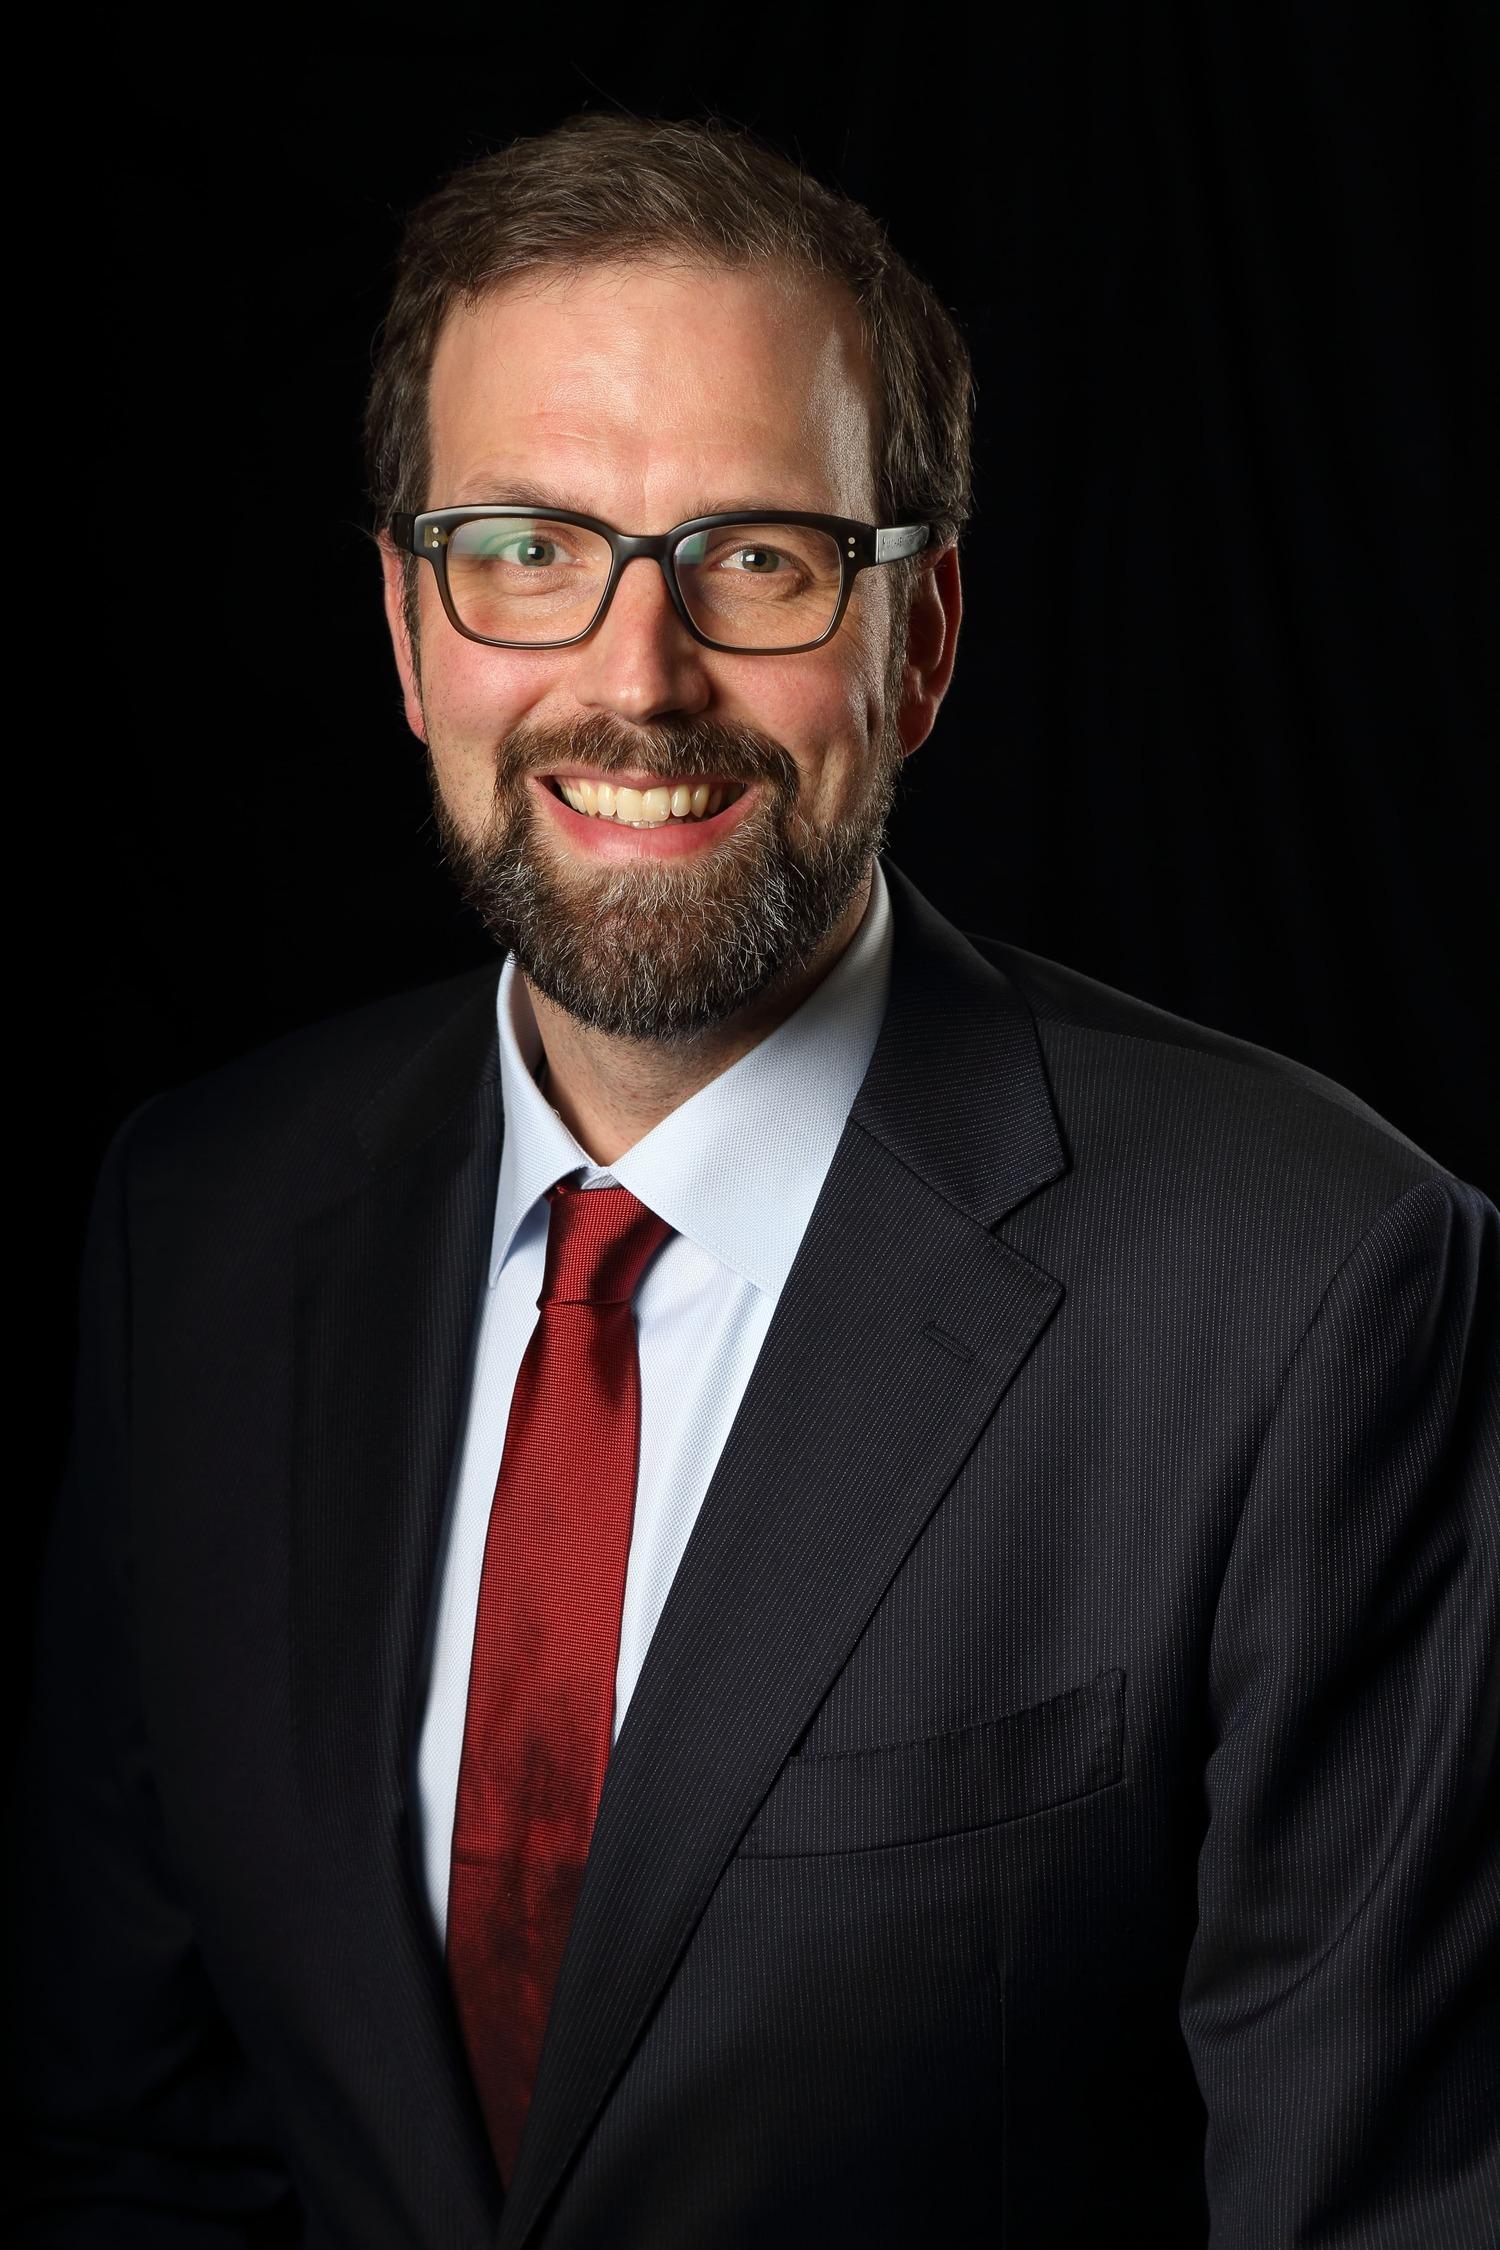 Martijn A. Spruit - Preview Image